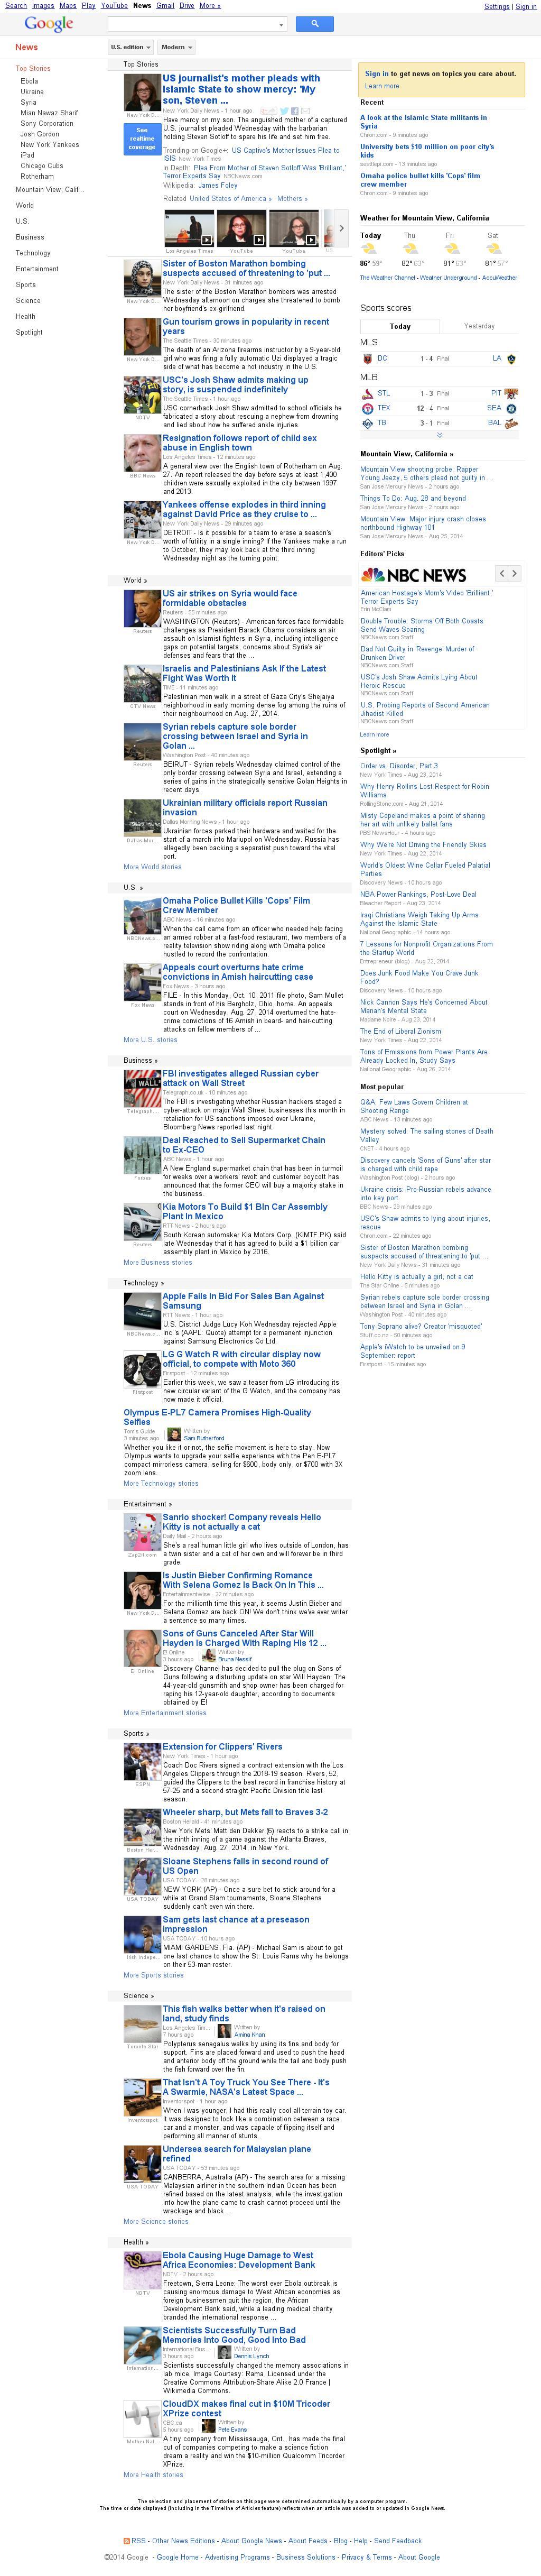 Google News at Thursday Aug. 28, 2014, 6:07 a.m. UTC